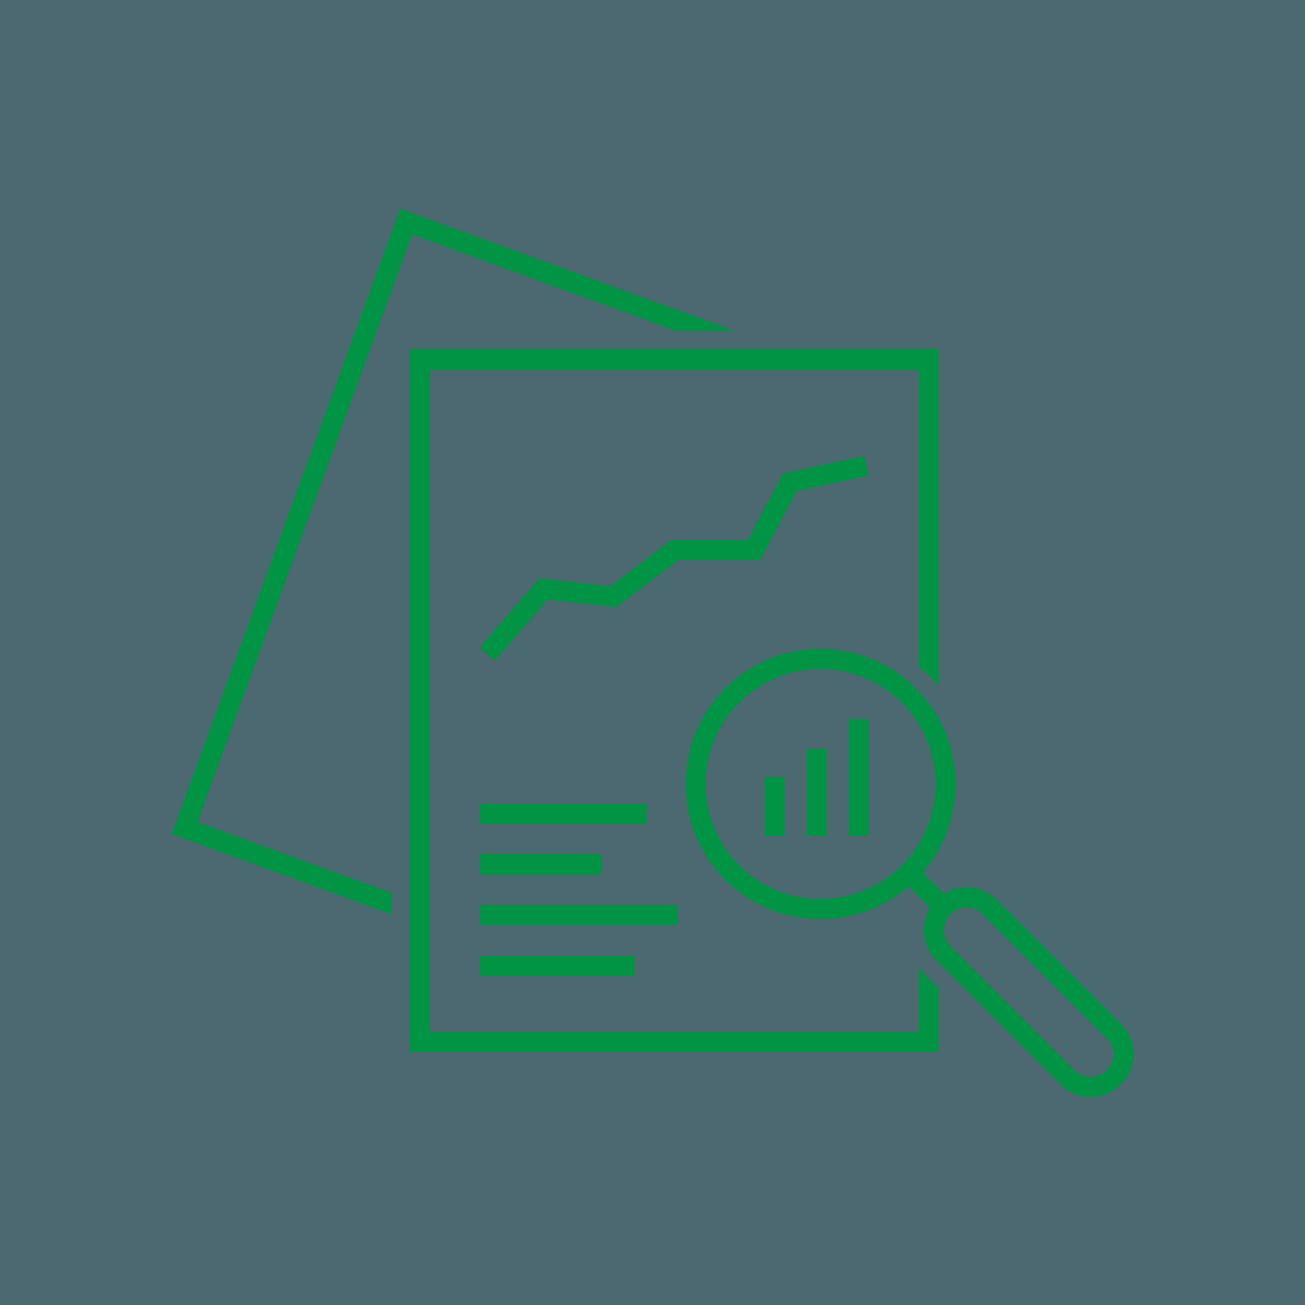 Strategic consultancy icon